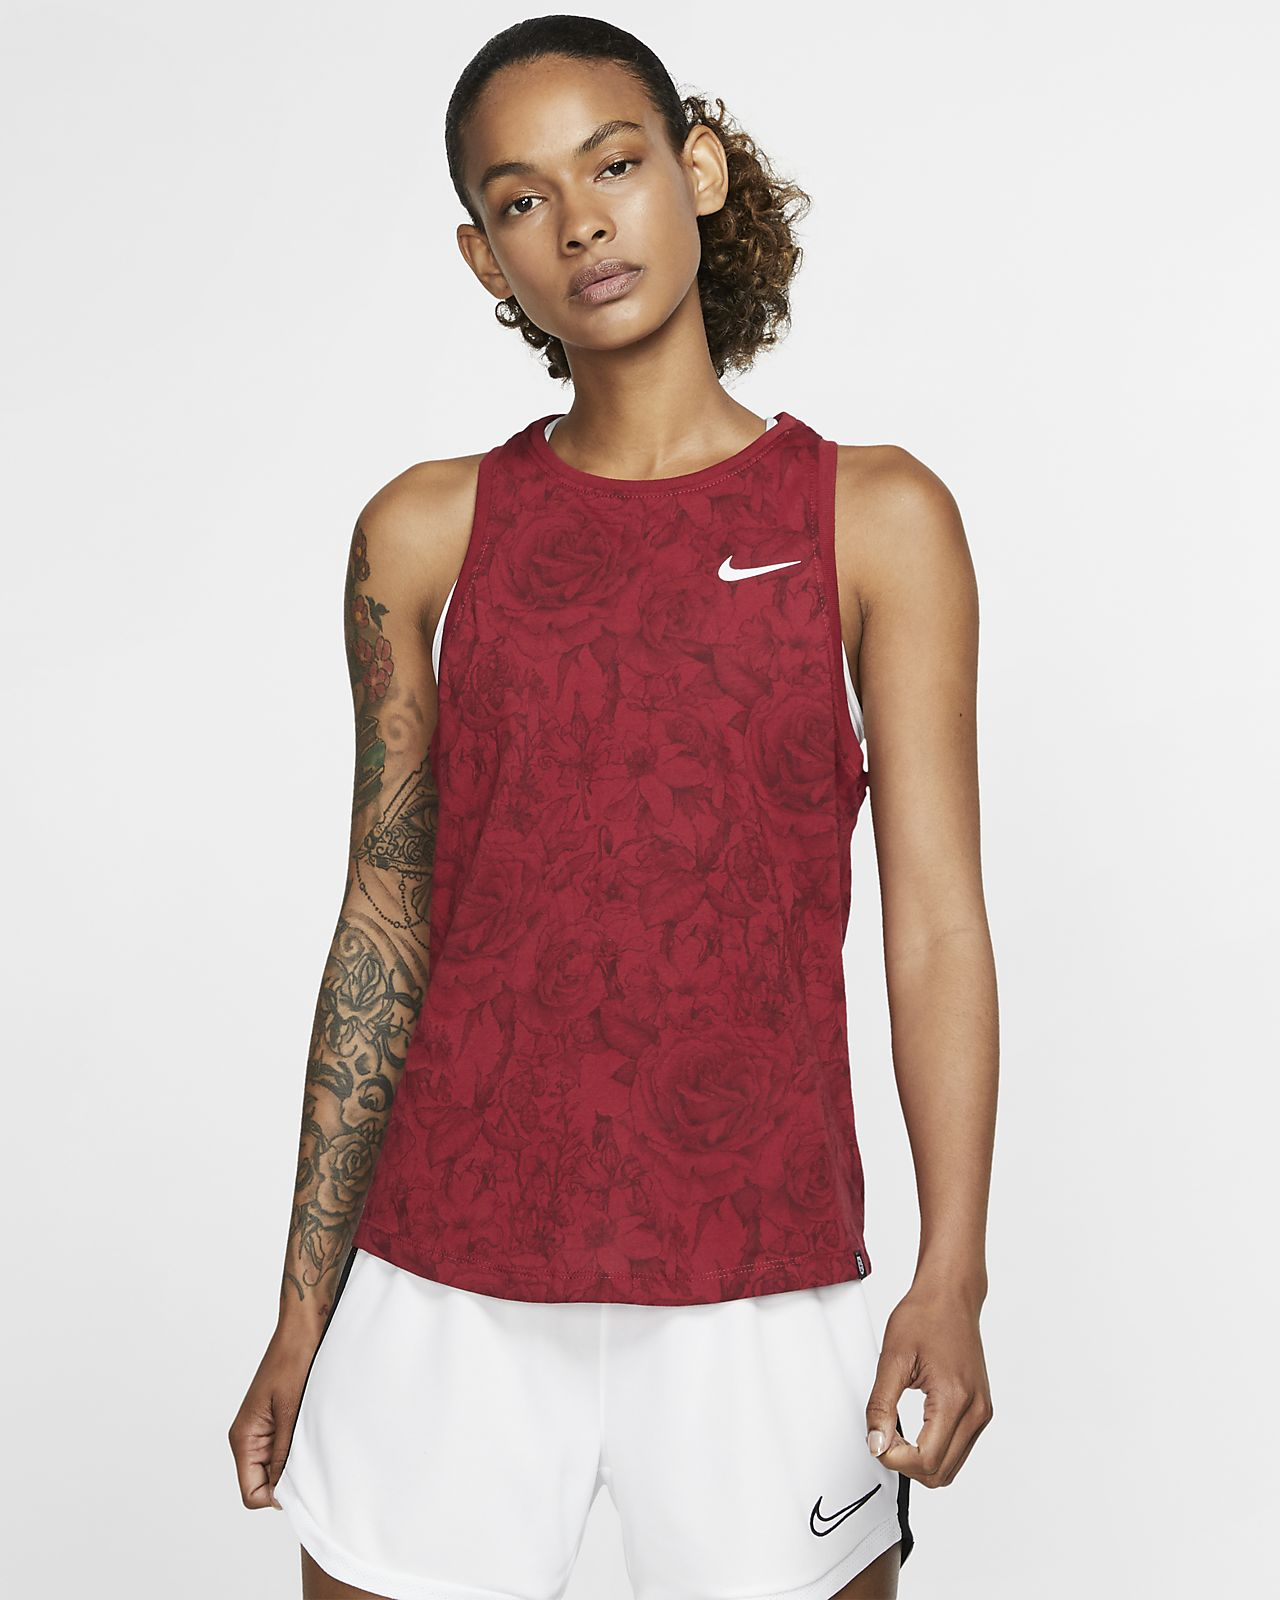 England Camiseta de tirantes de fútbol - Mujer